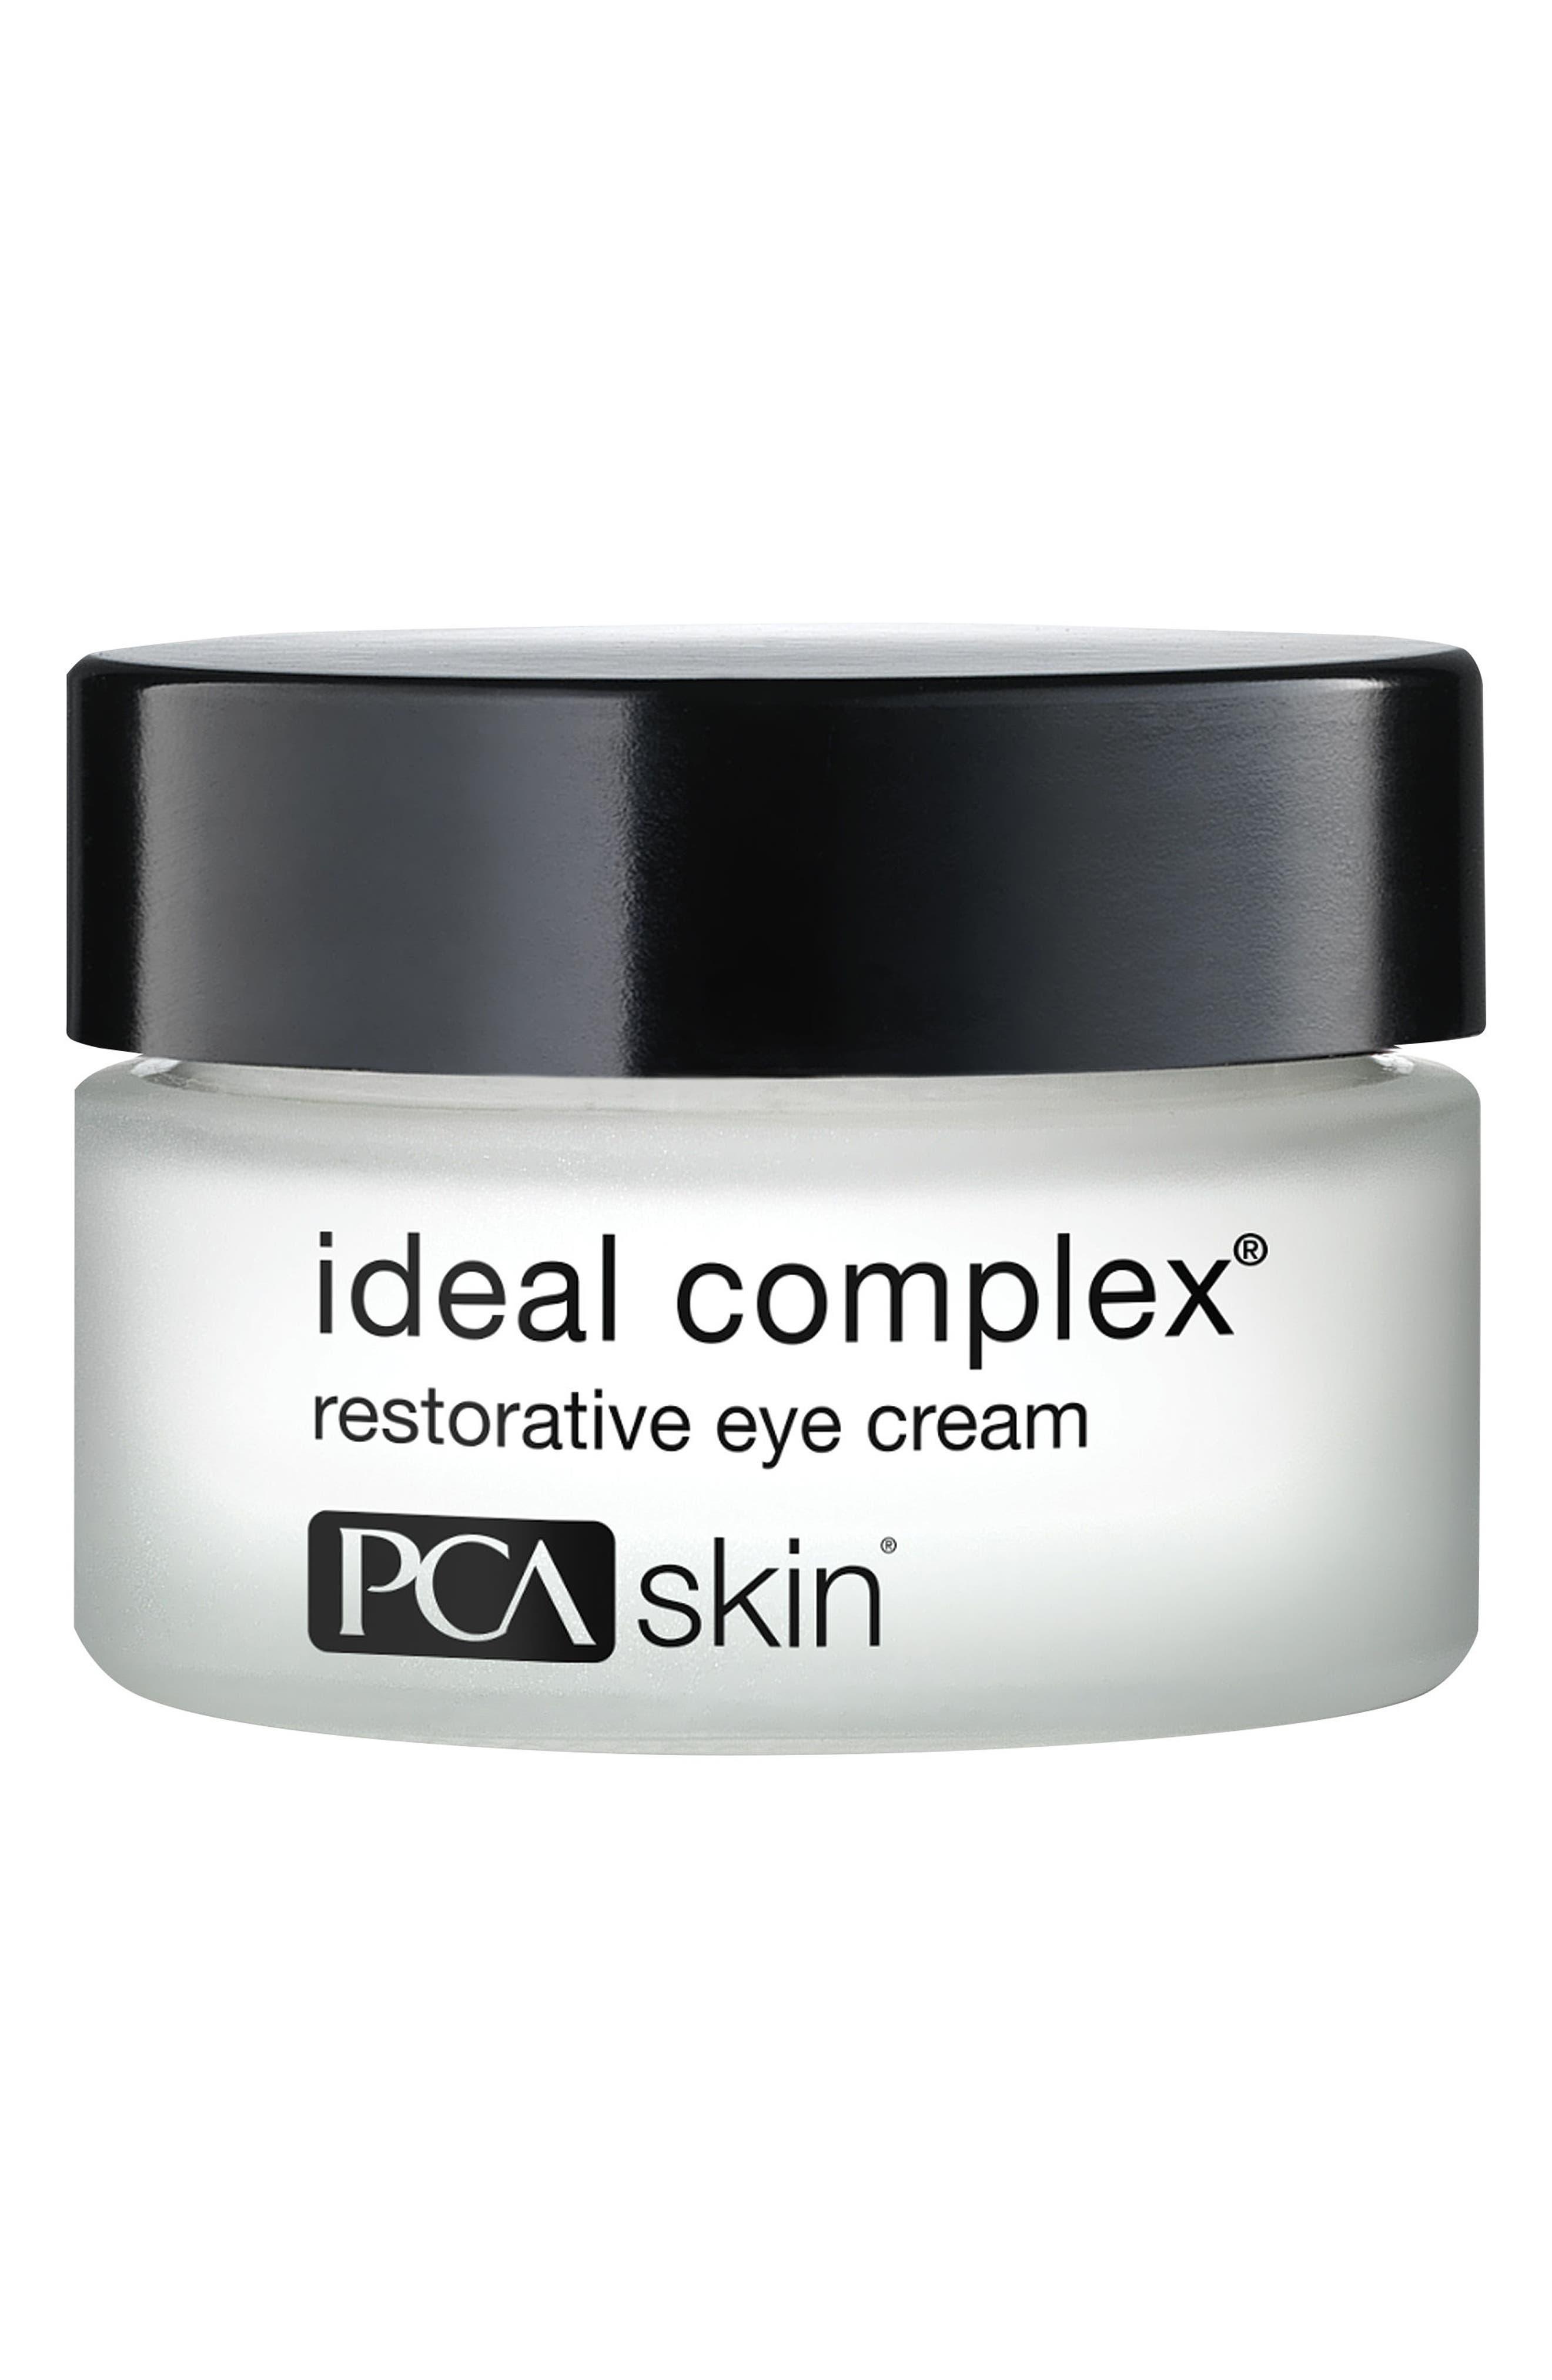 PCA SKIN,                             Ideal Complex Restorative Eye Cream,                             Main thumbnail 1, color,                             NO COLOR